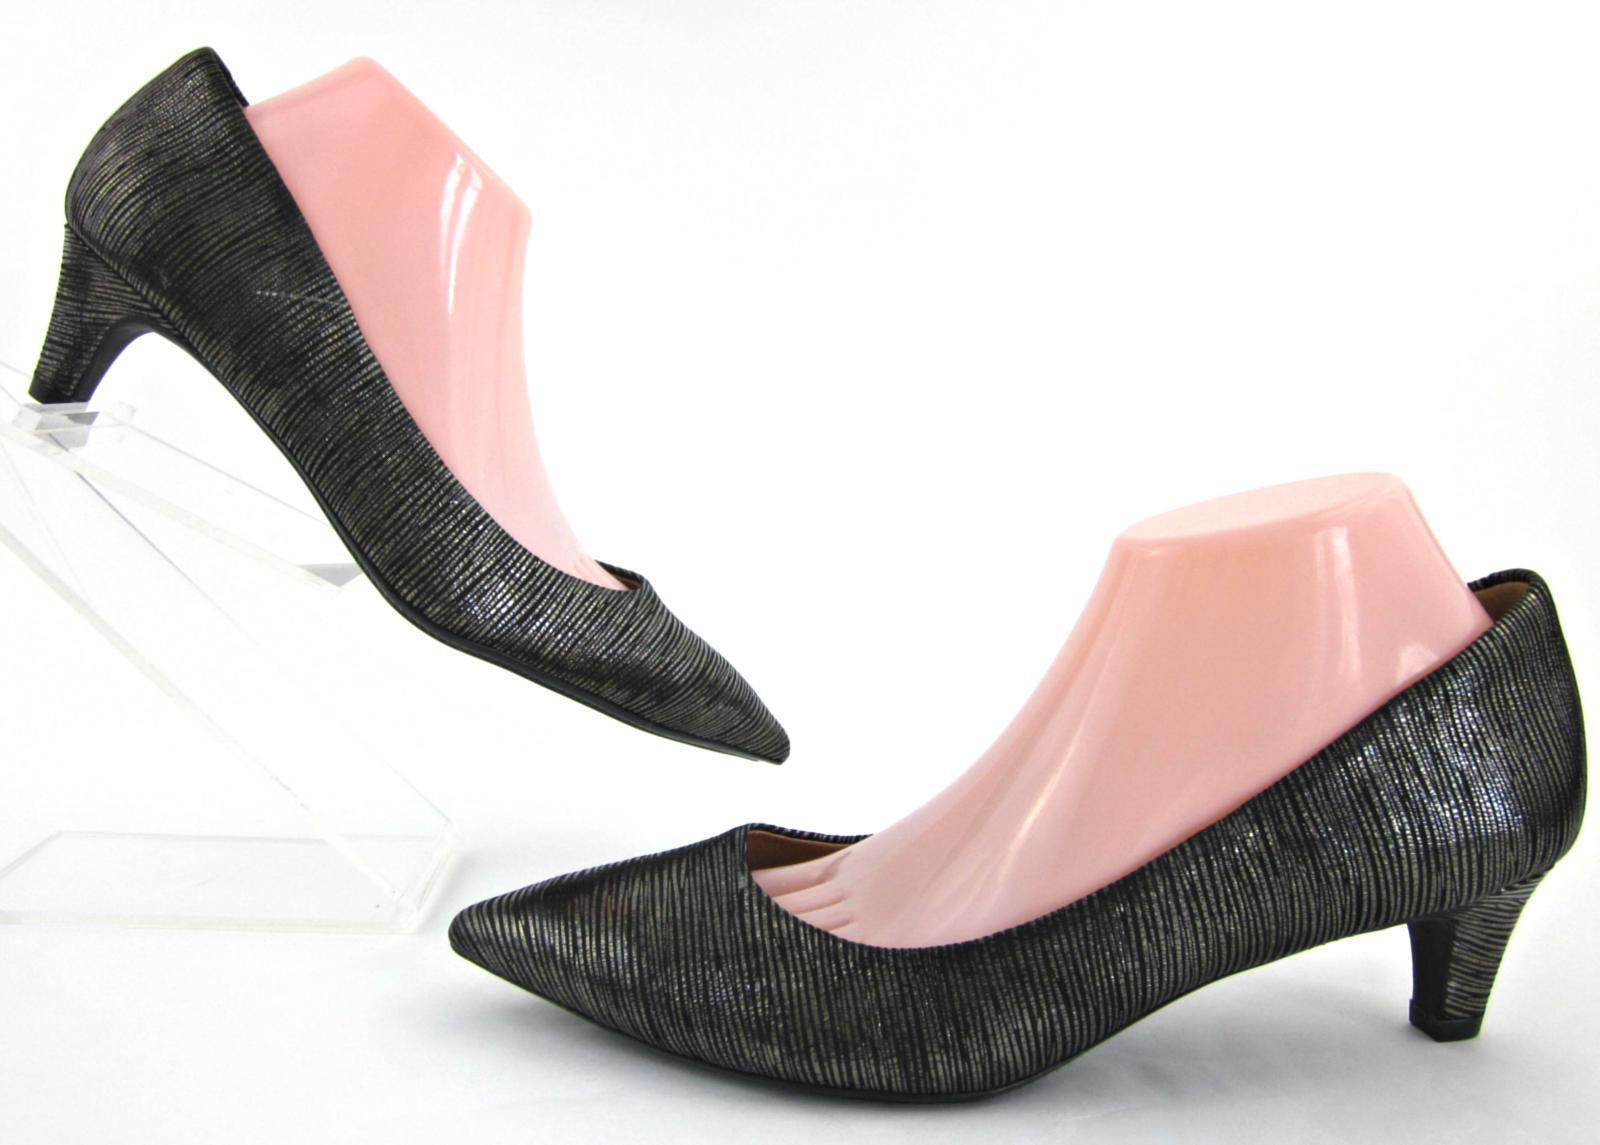 NEW  Sofft 'Altessa' Point Toe Kitten Heel Pumps Silver Black Metallic US 10M